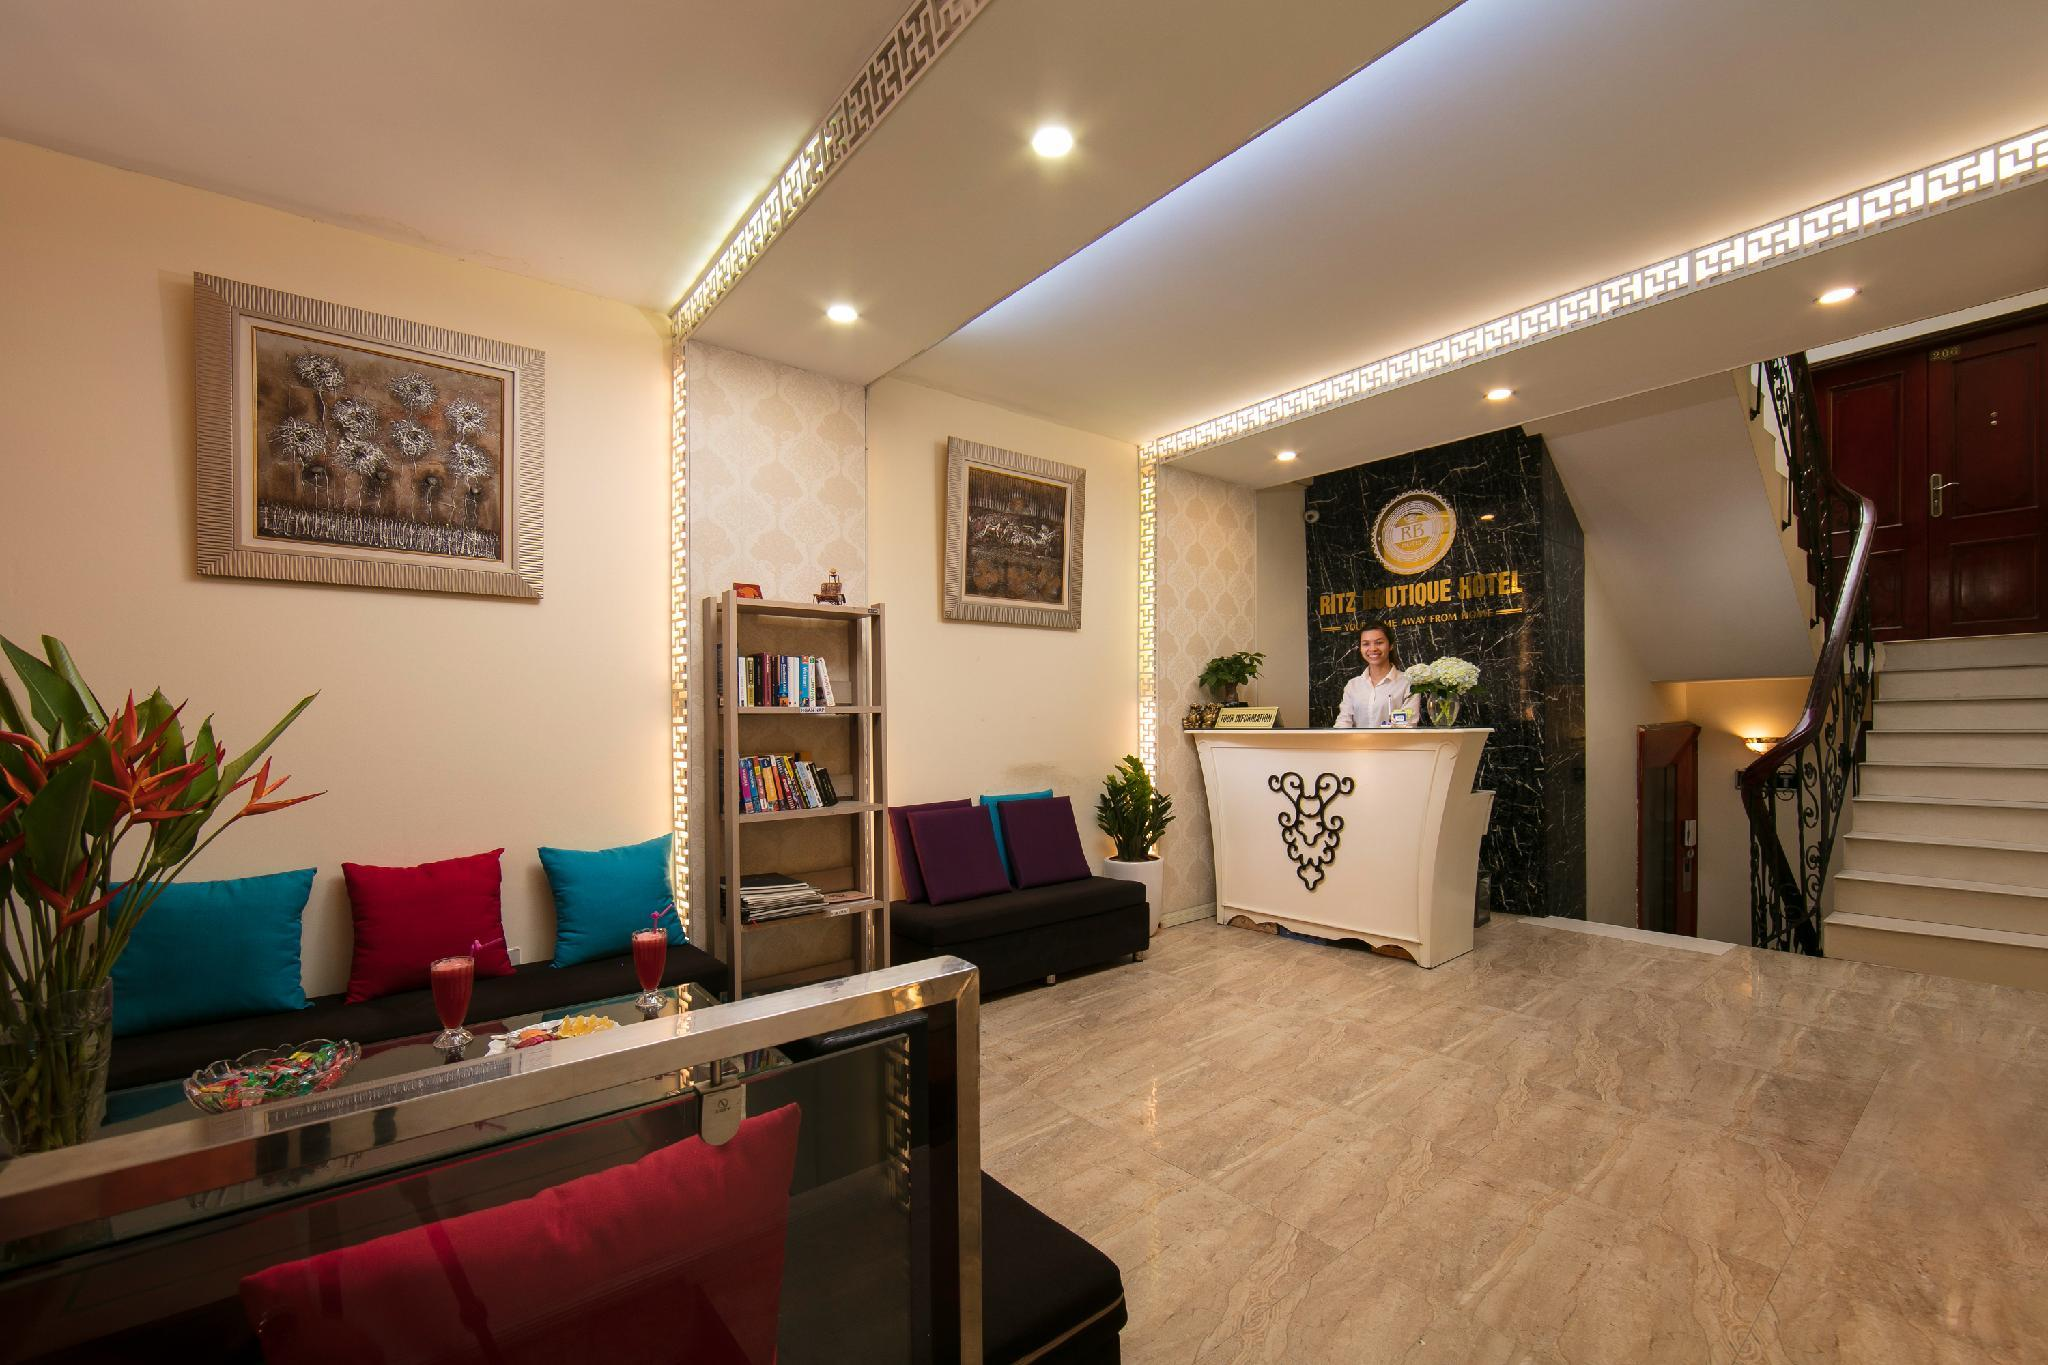 7S Hotel Ritz Boutique